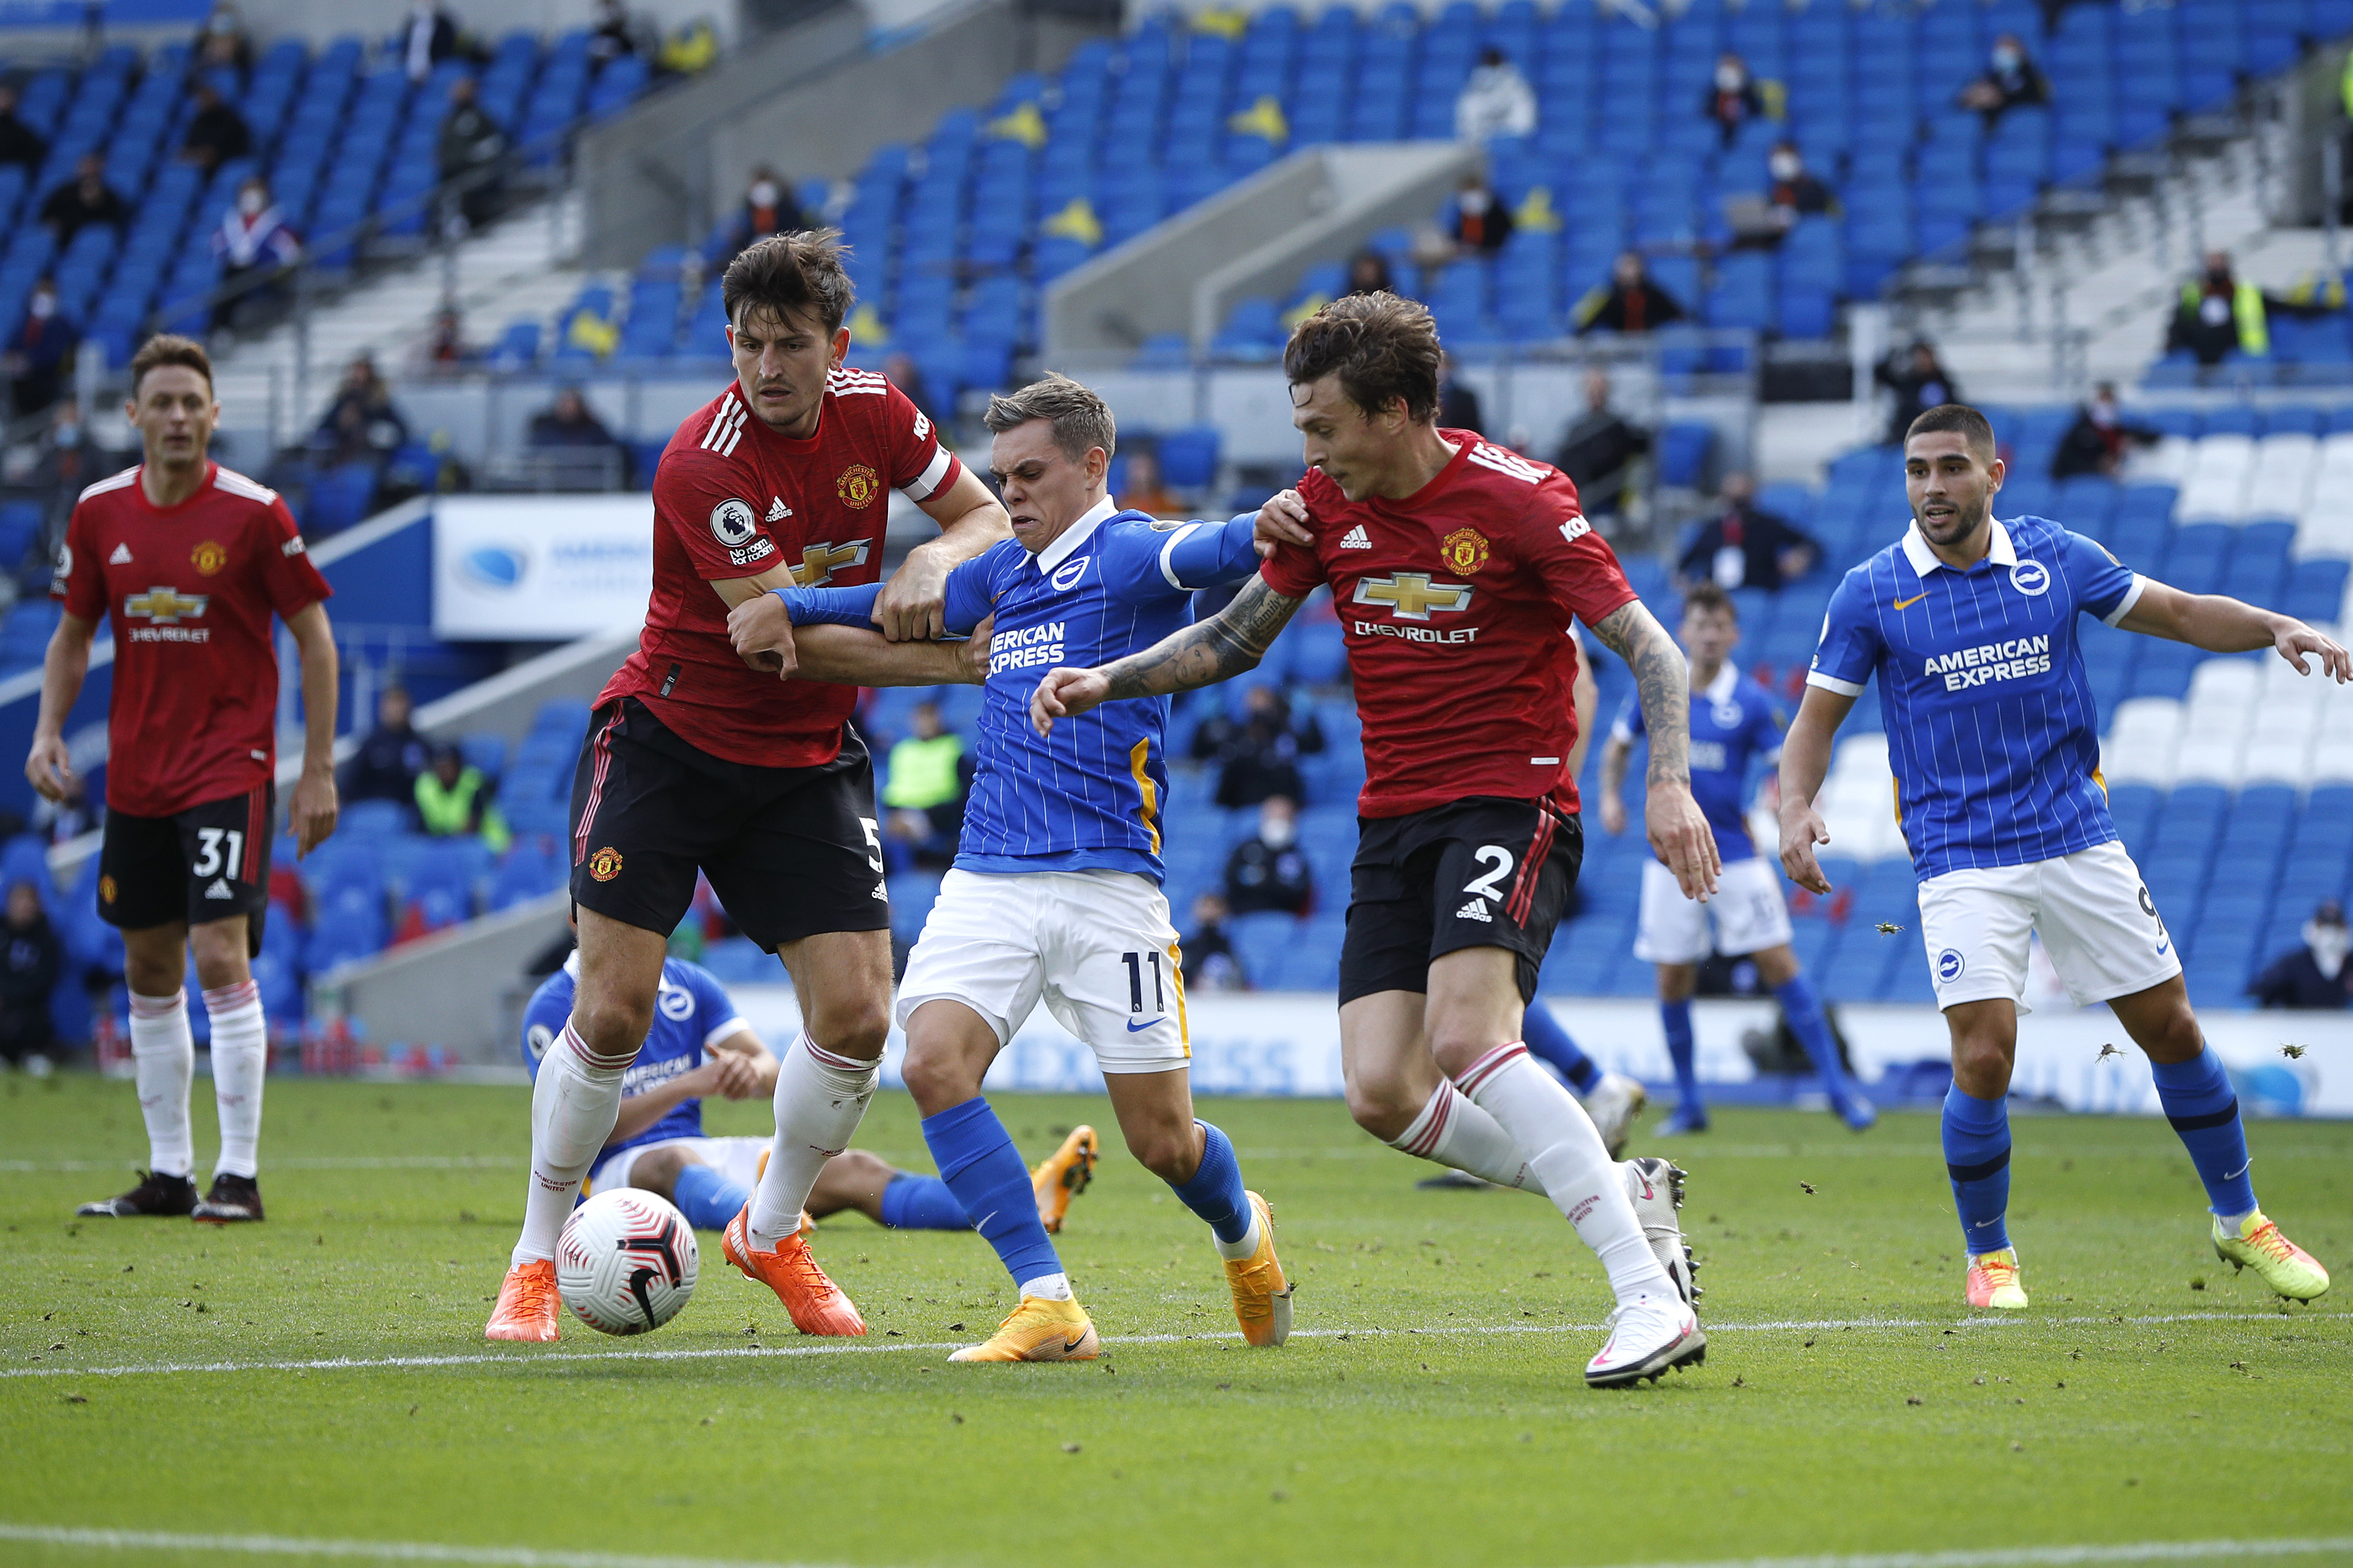 brighton-and-hove-albion-v-manchester-united-premier-league(2).jpg